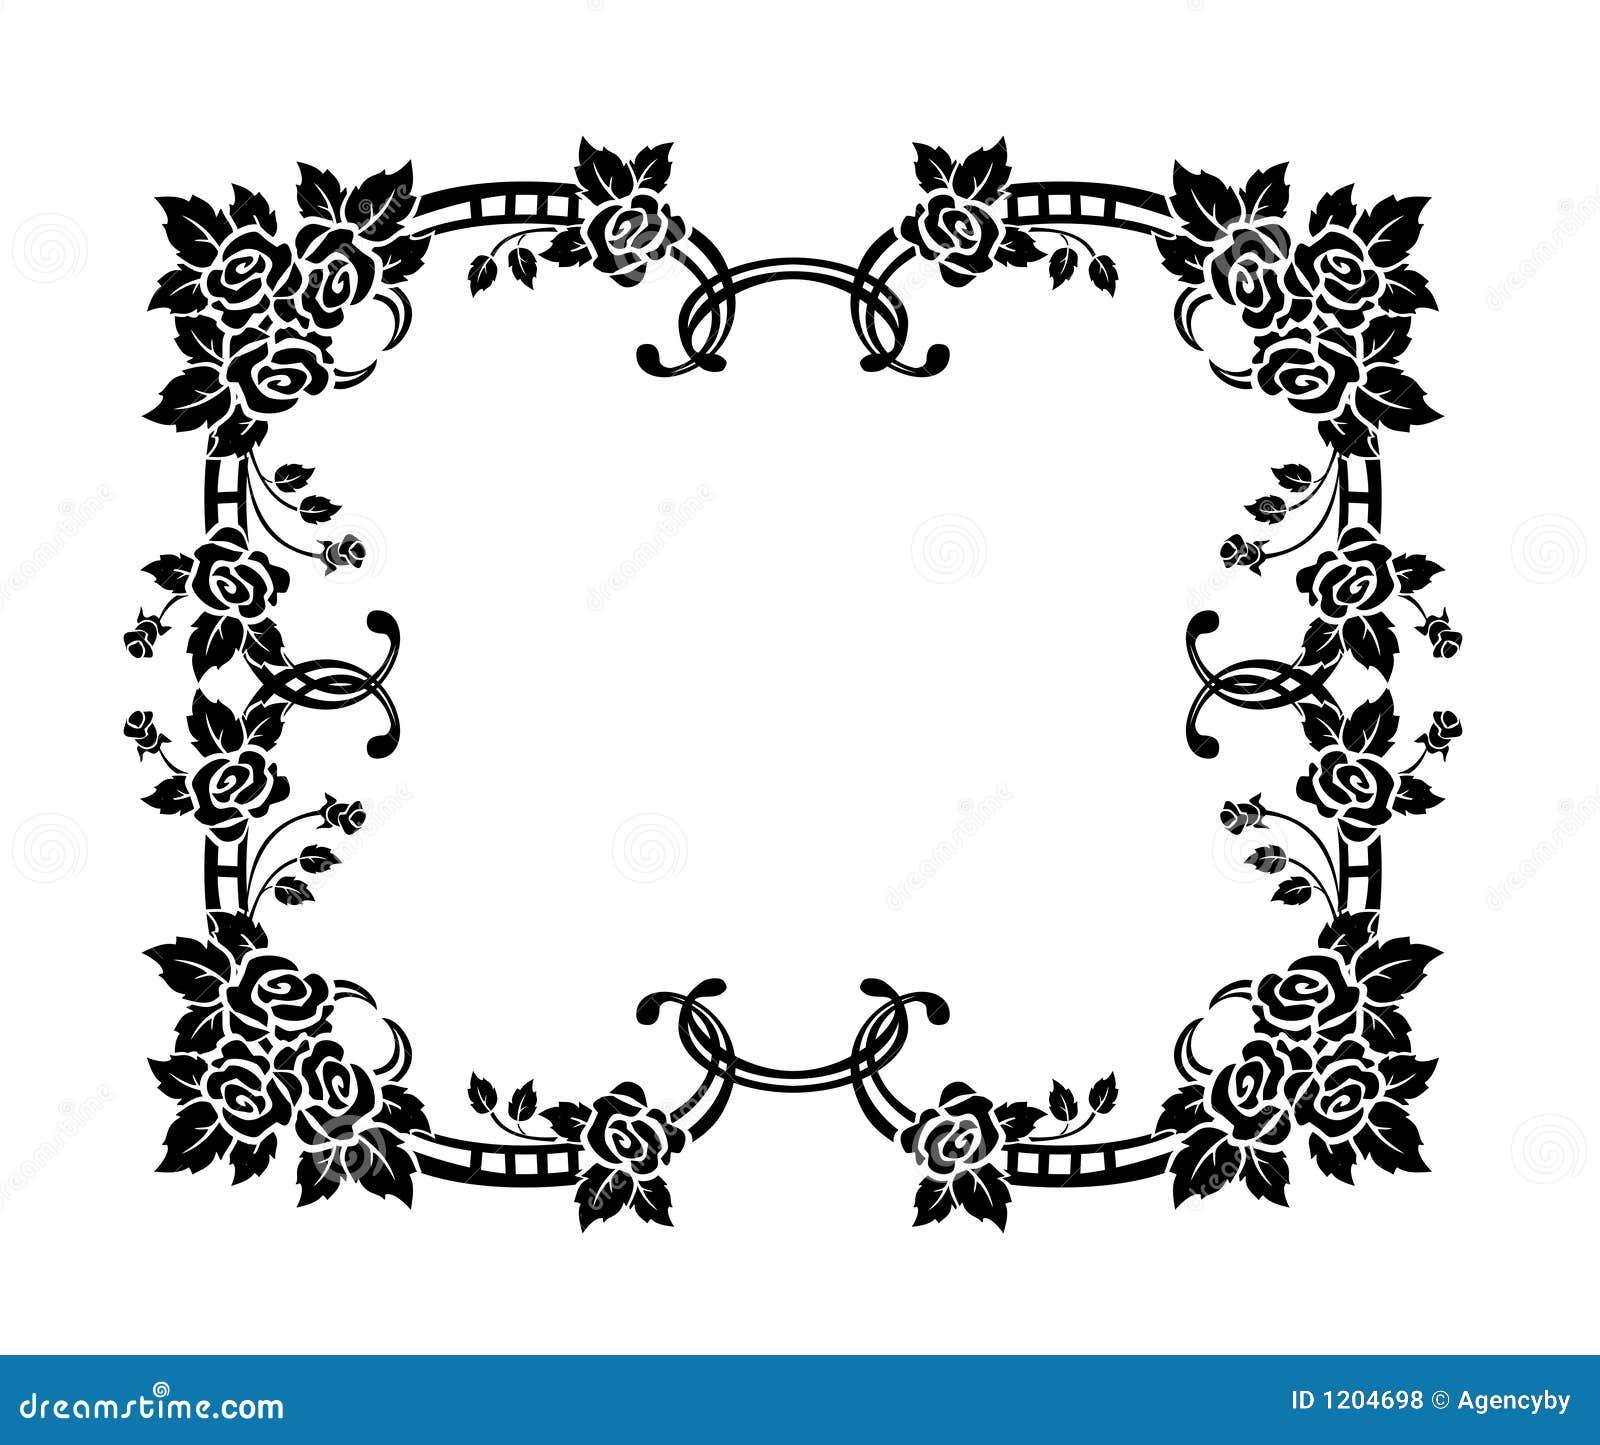 Decorative Border Ornament Royalty Free Stock Photos Image 1204698